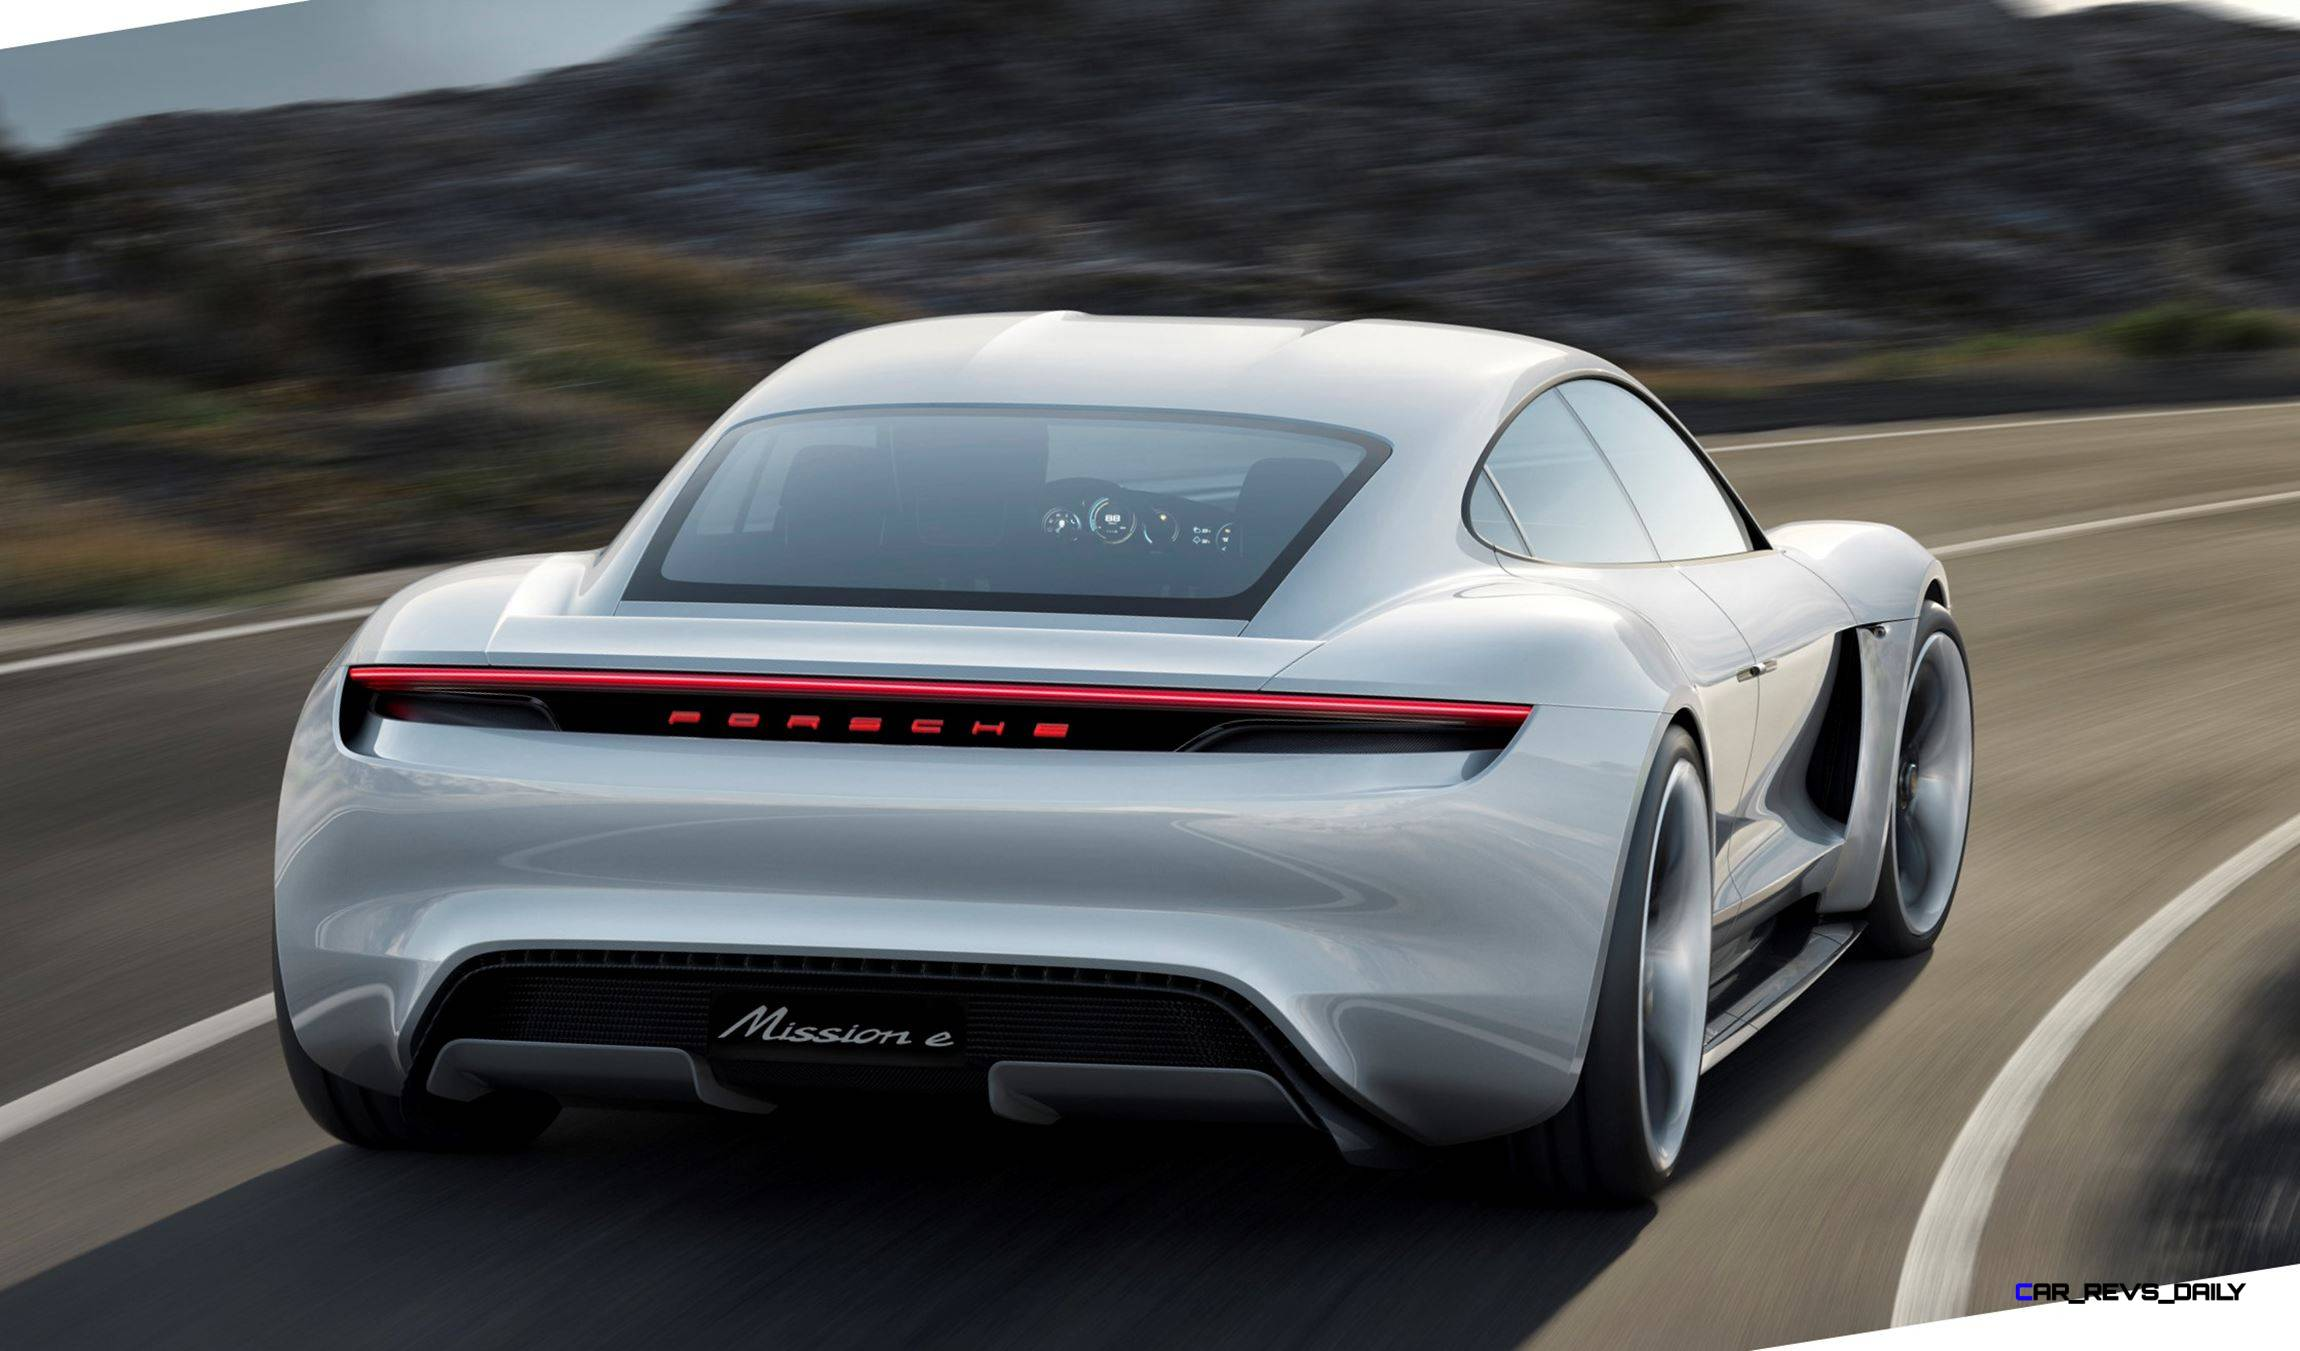 3 5s 2015 Porsche Mission E 600hp Concept Is 4 Door